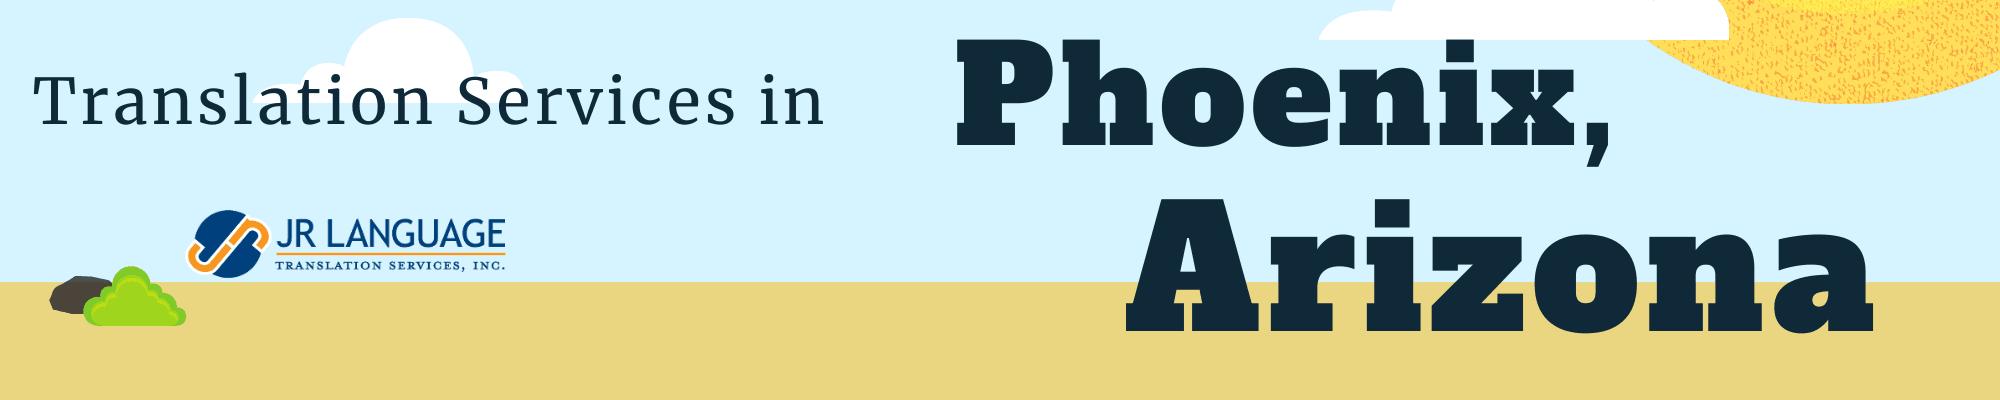 Translation Services for Phoenix Arizona